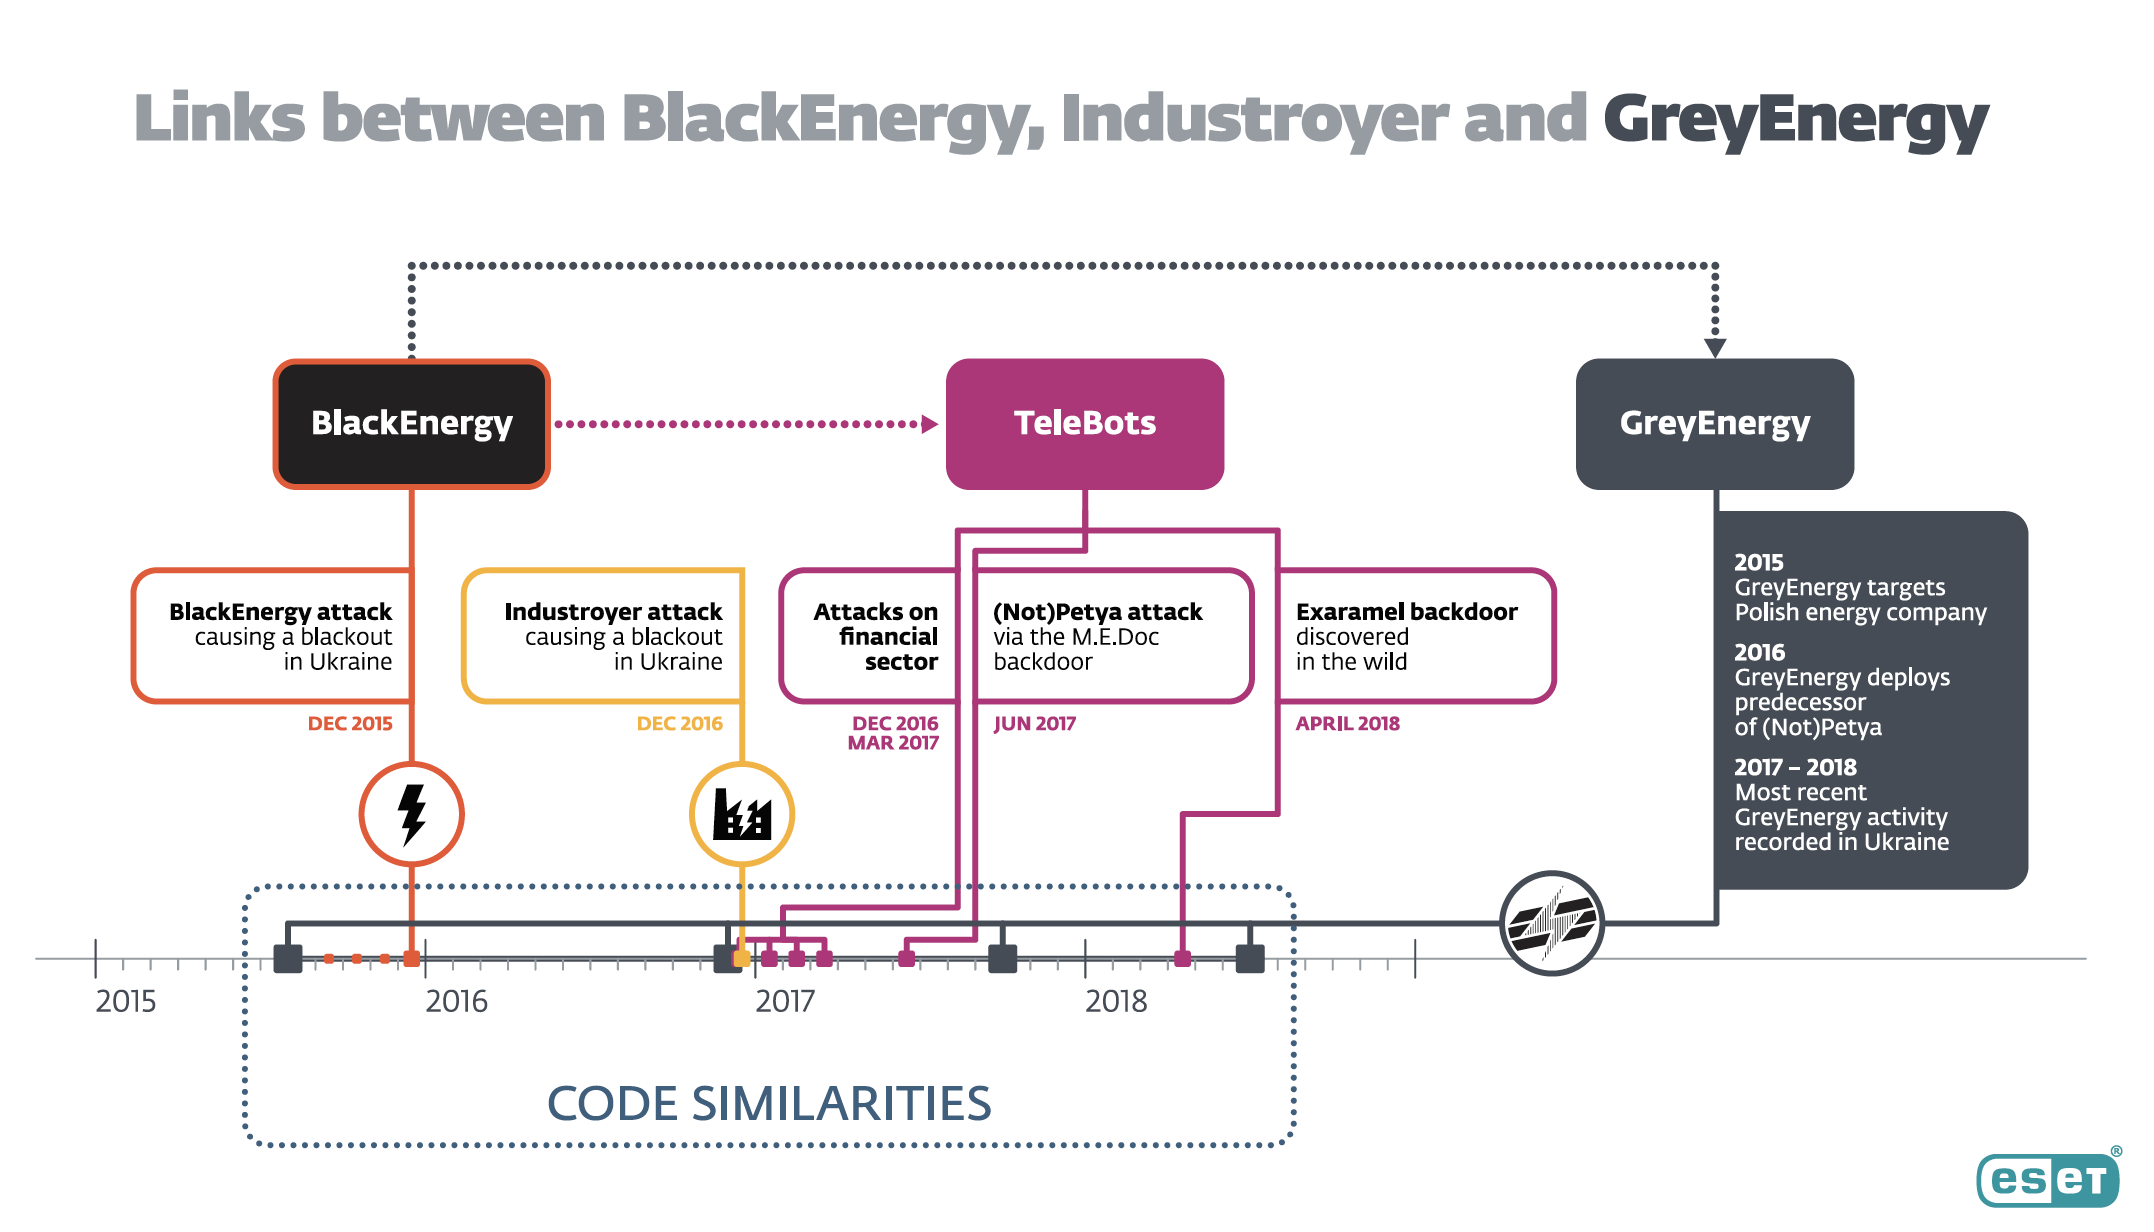 Meet GreyEnergy, the newest hacking group hitting Ukraine's